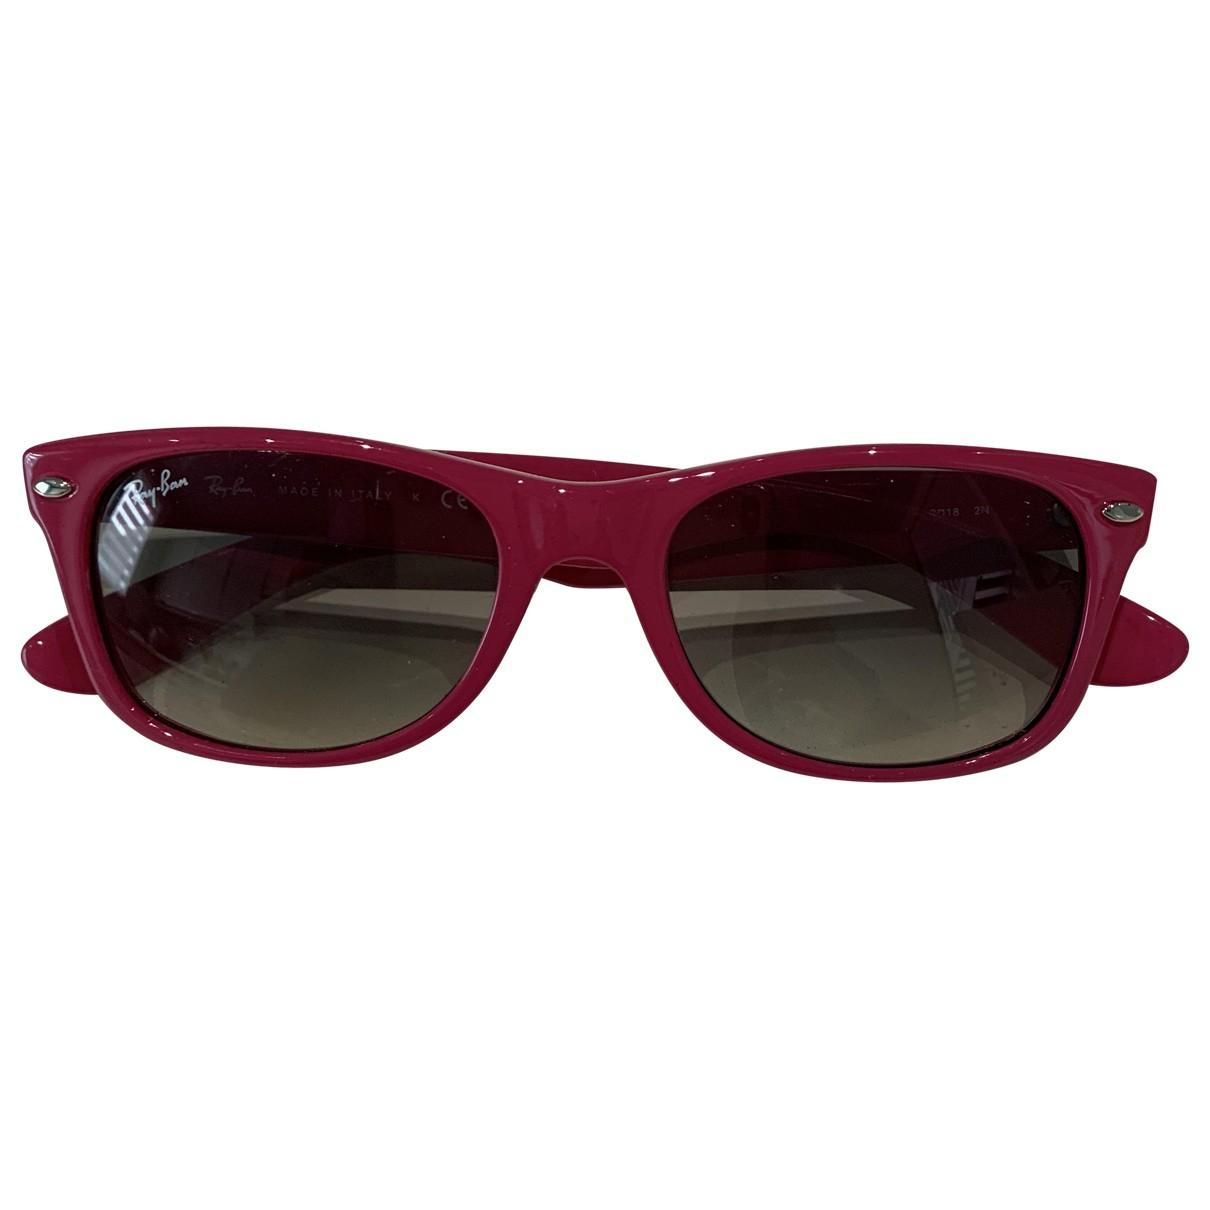 Ray-ban Original Wayfarer Pink Sunglasses for Women N